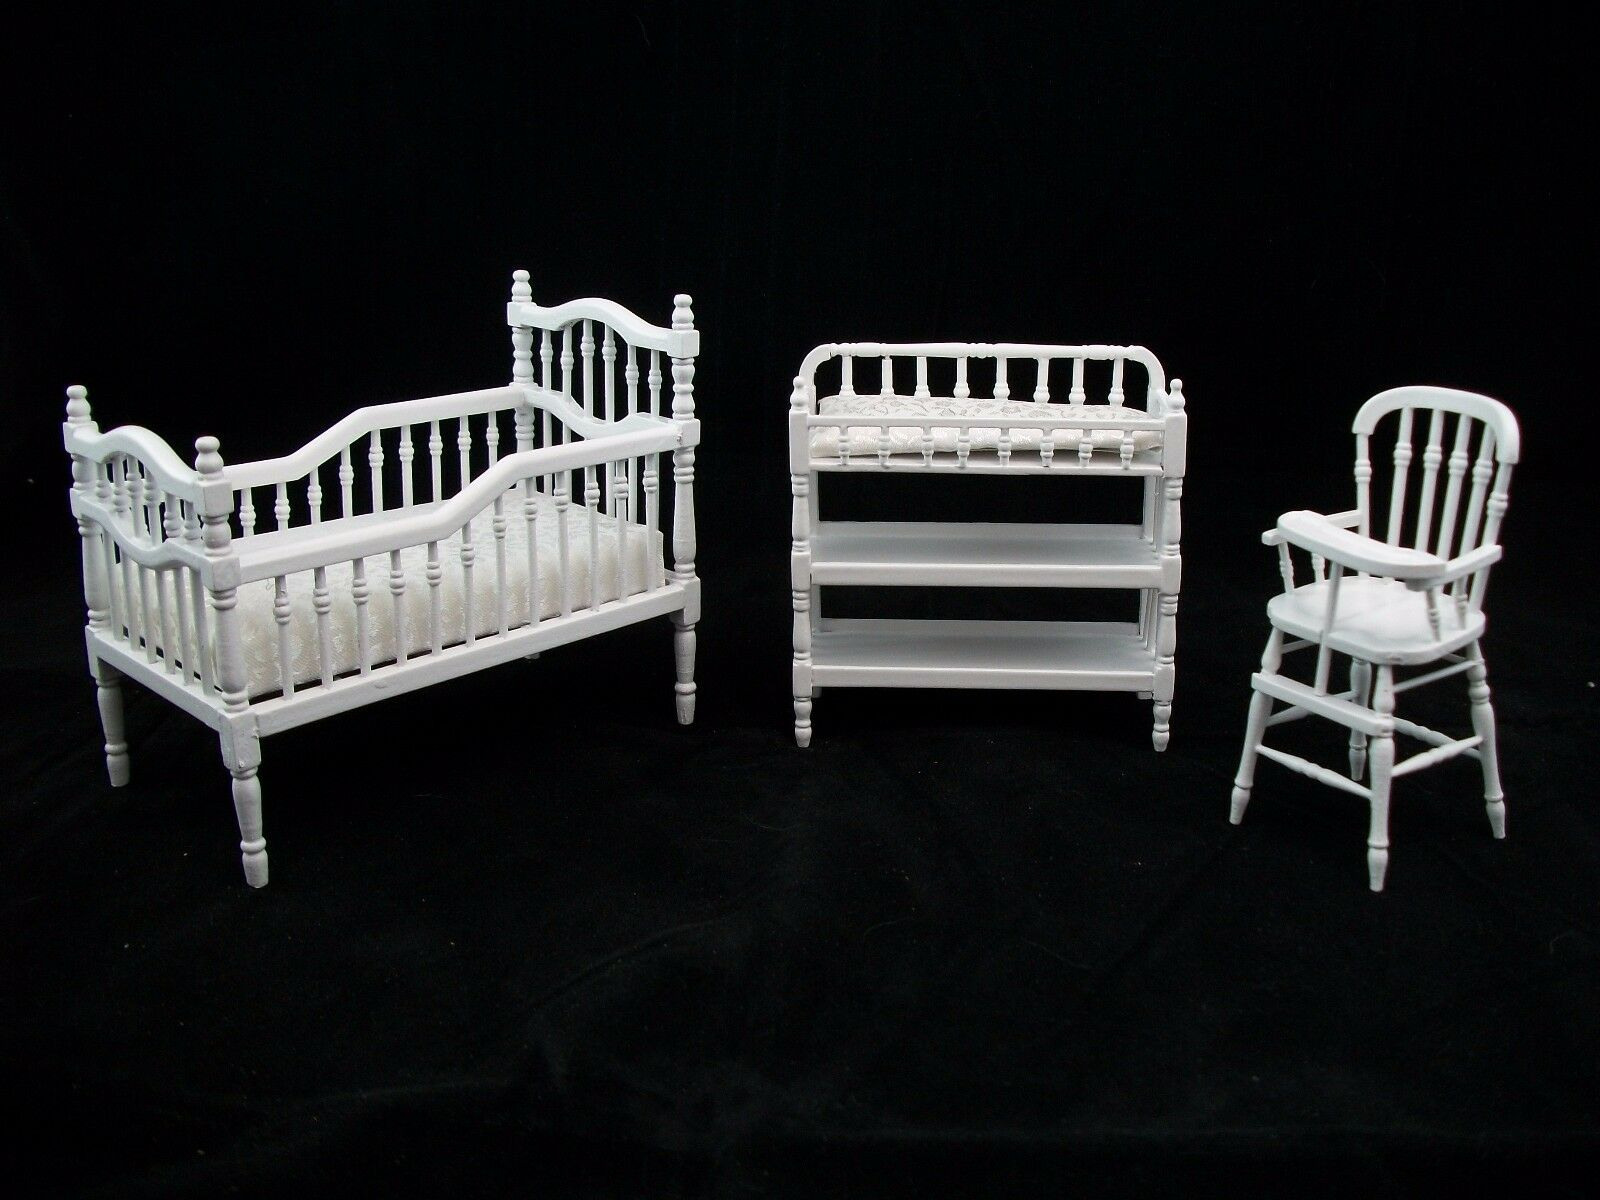 Nursery Baby Room Set blancoo dollhouse miniature furniture 1 12 scale T5545 3pc